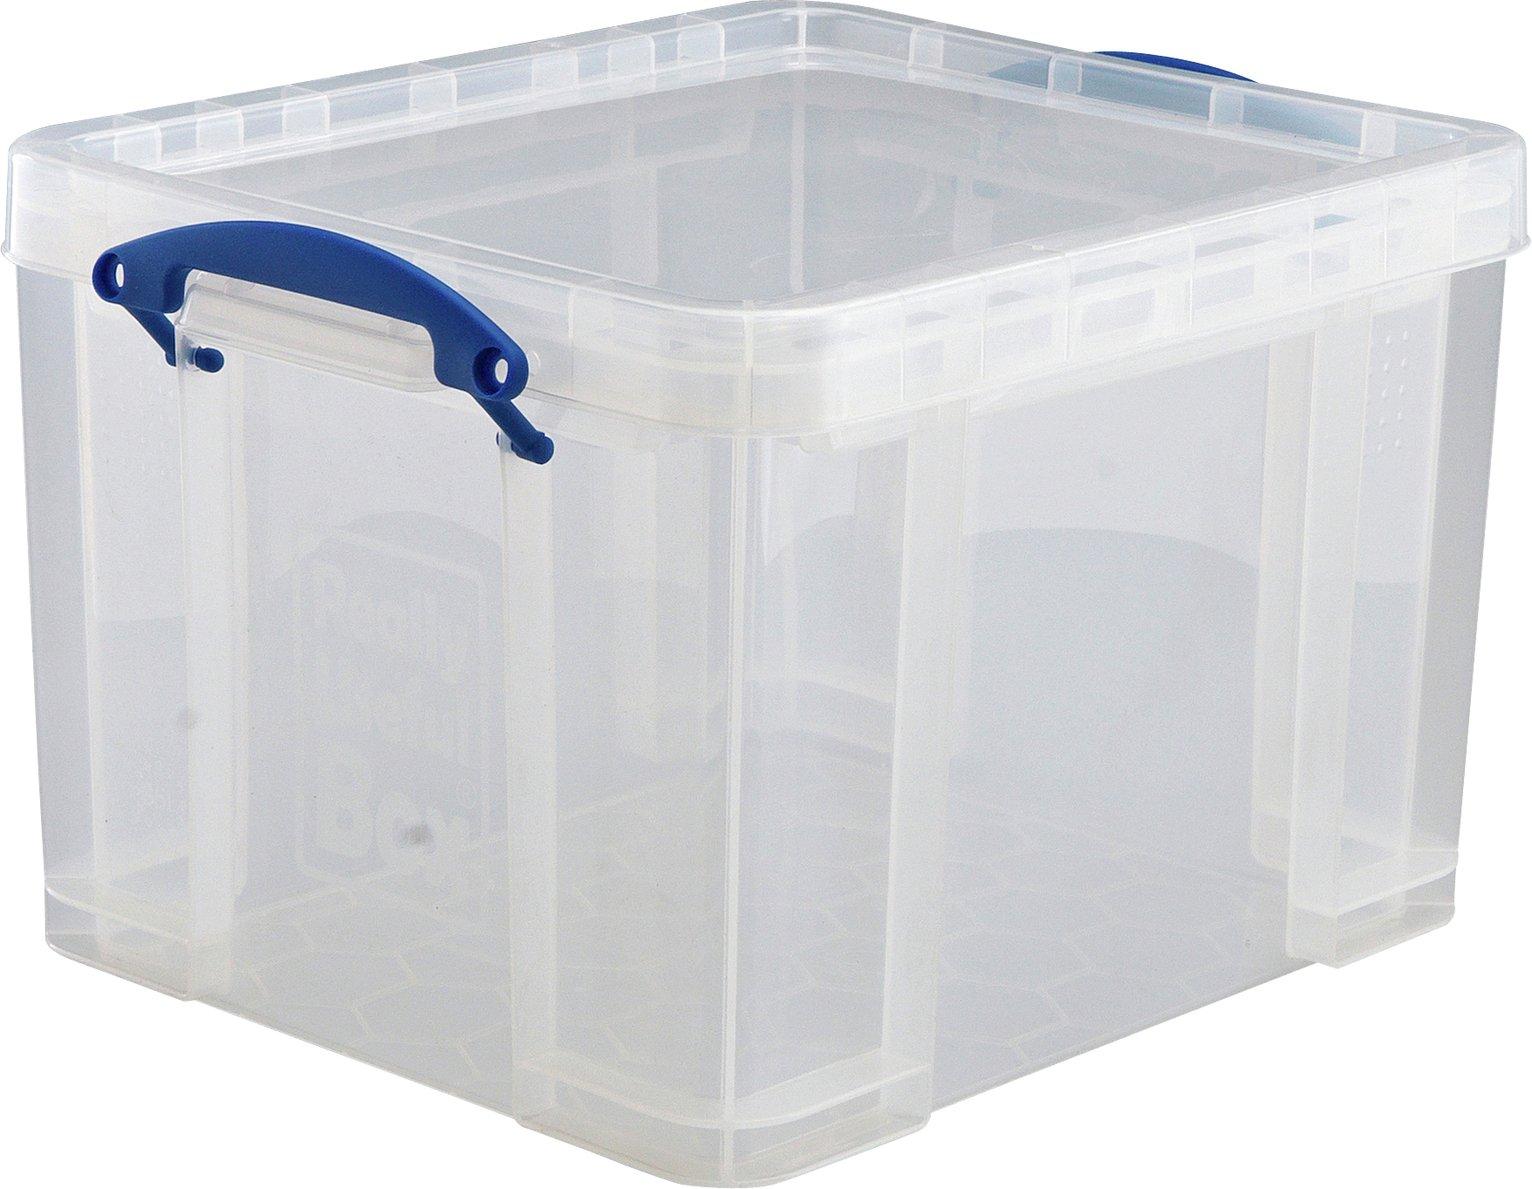 Plastic storage boxes and units  sc 1 st  Argos & Plastic storage boxes and units | Argos